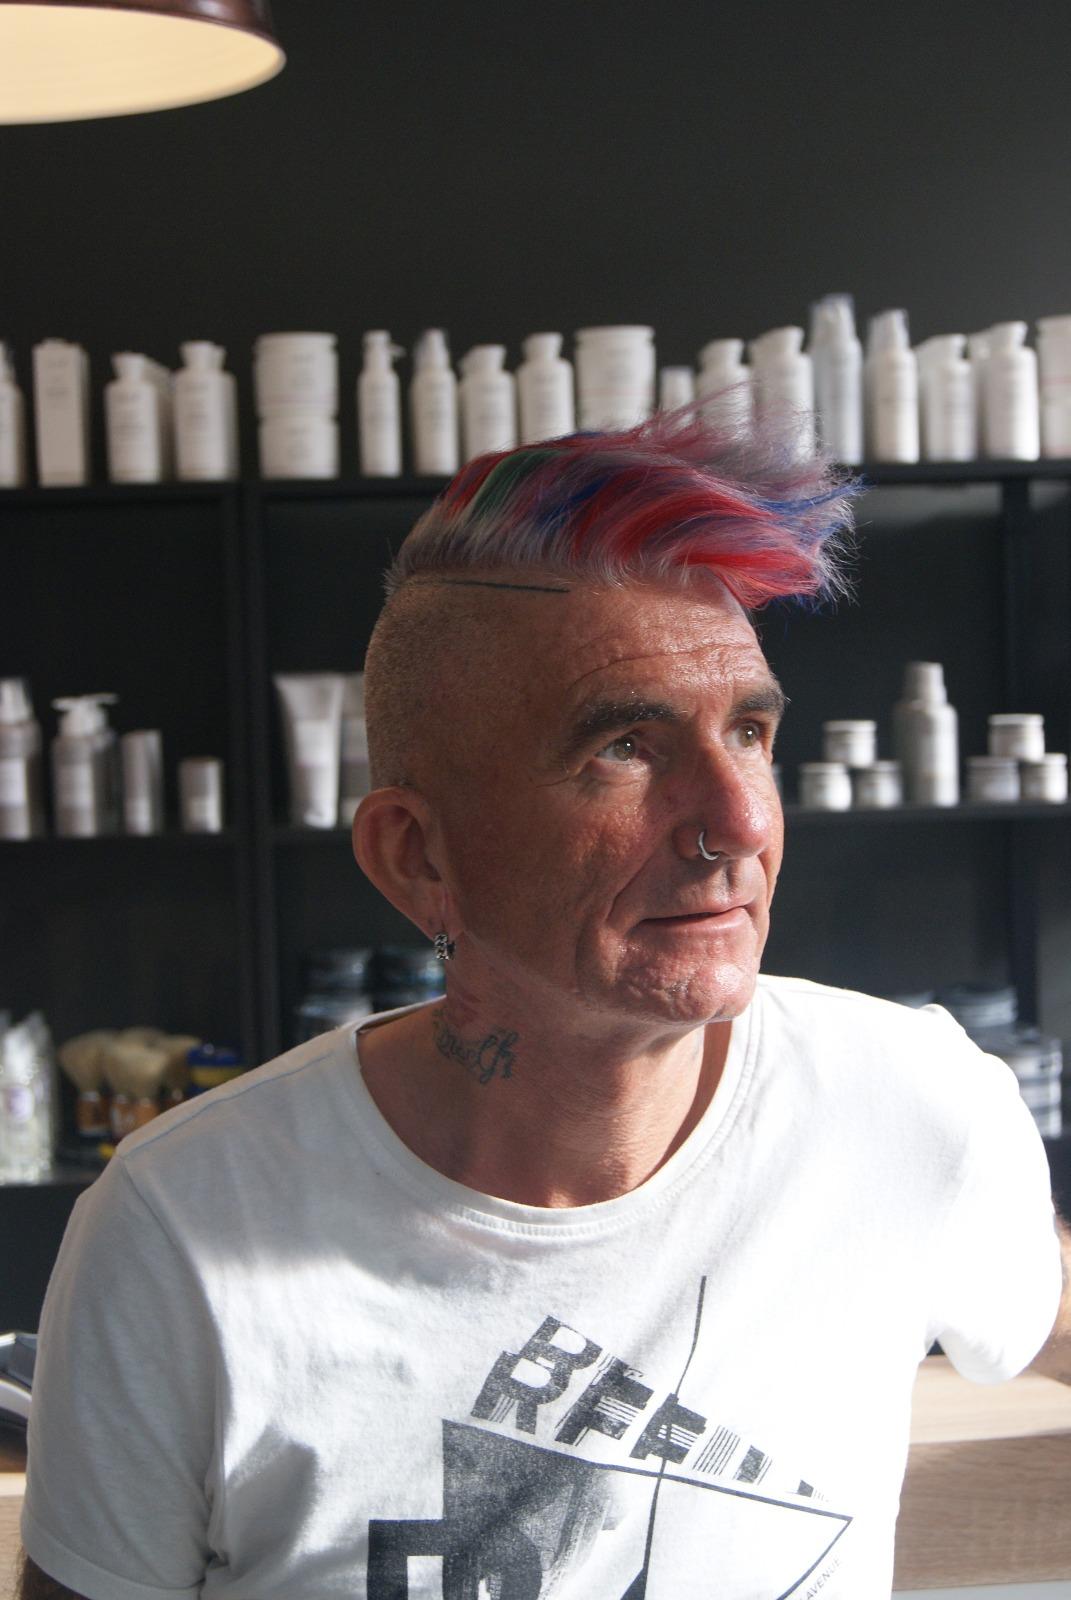 barbershop zutphen